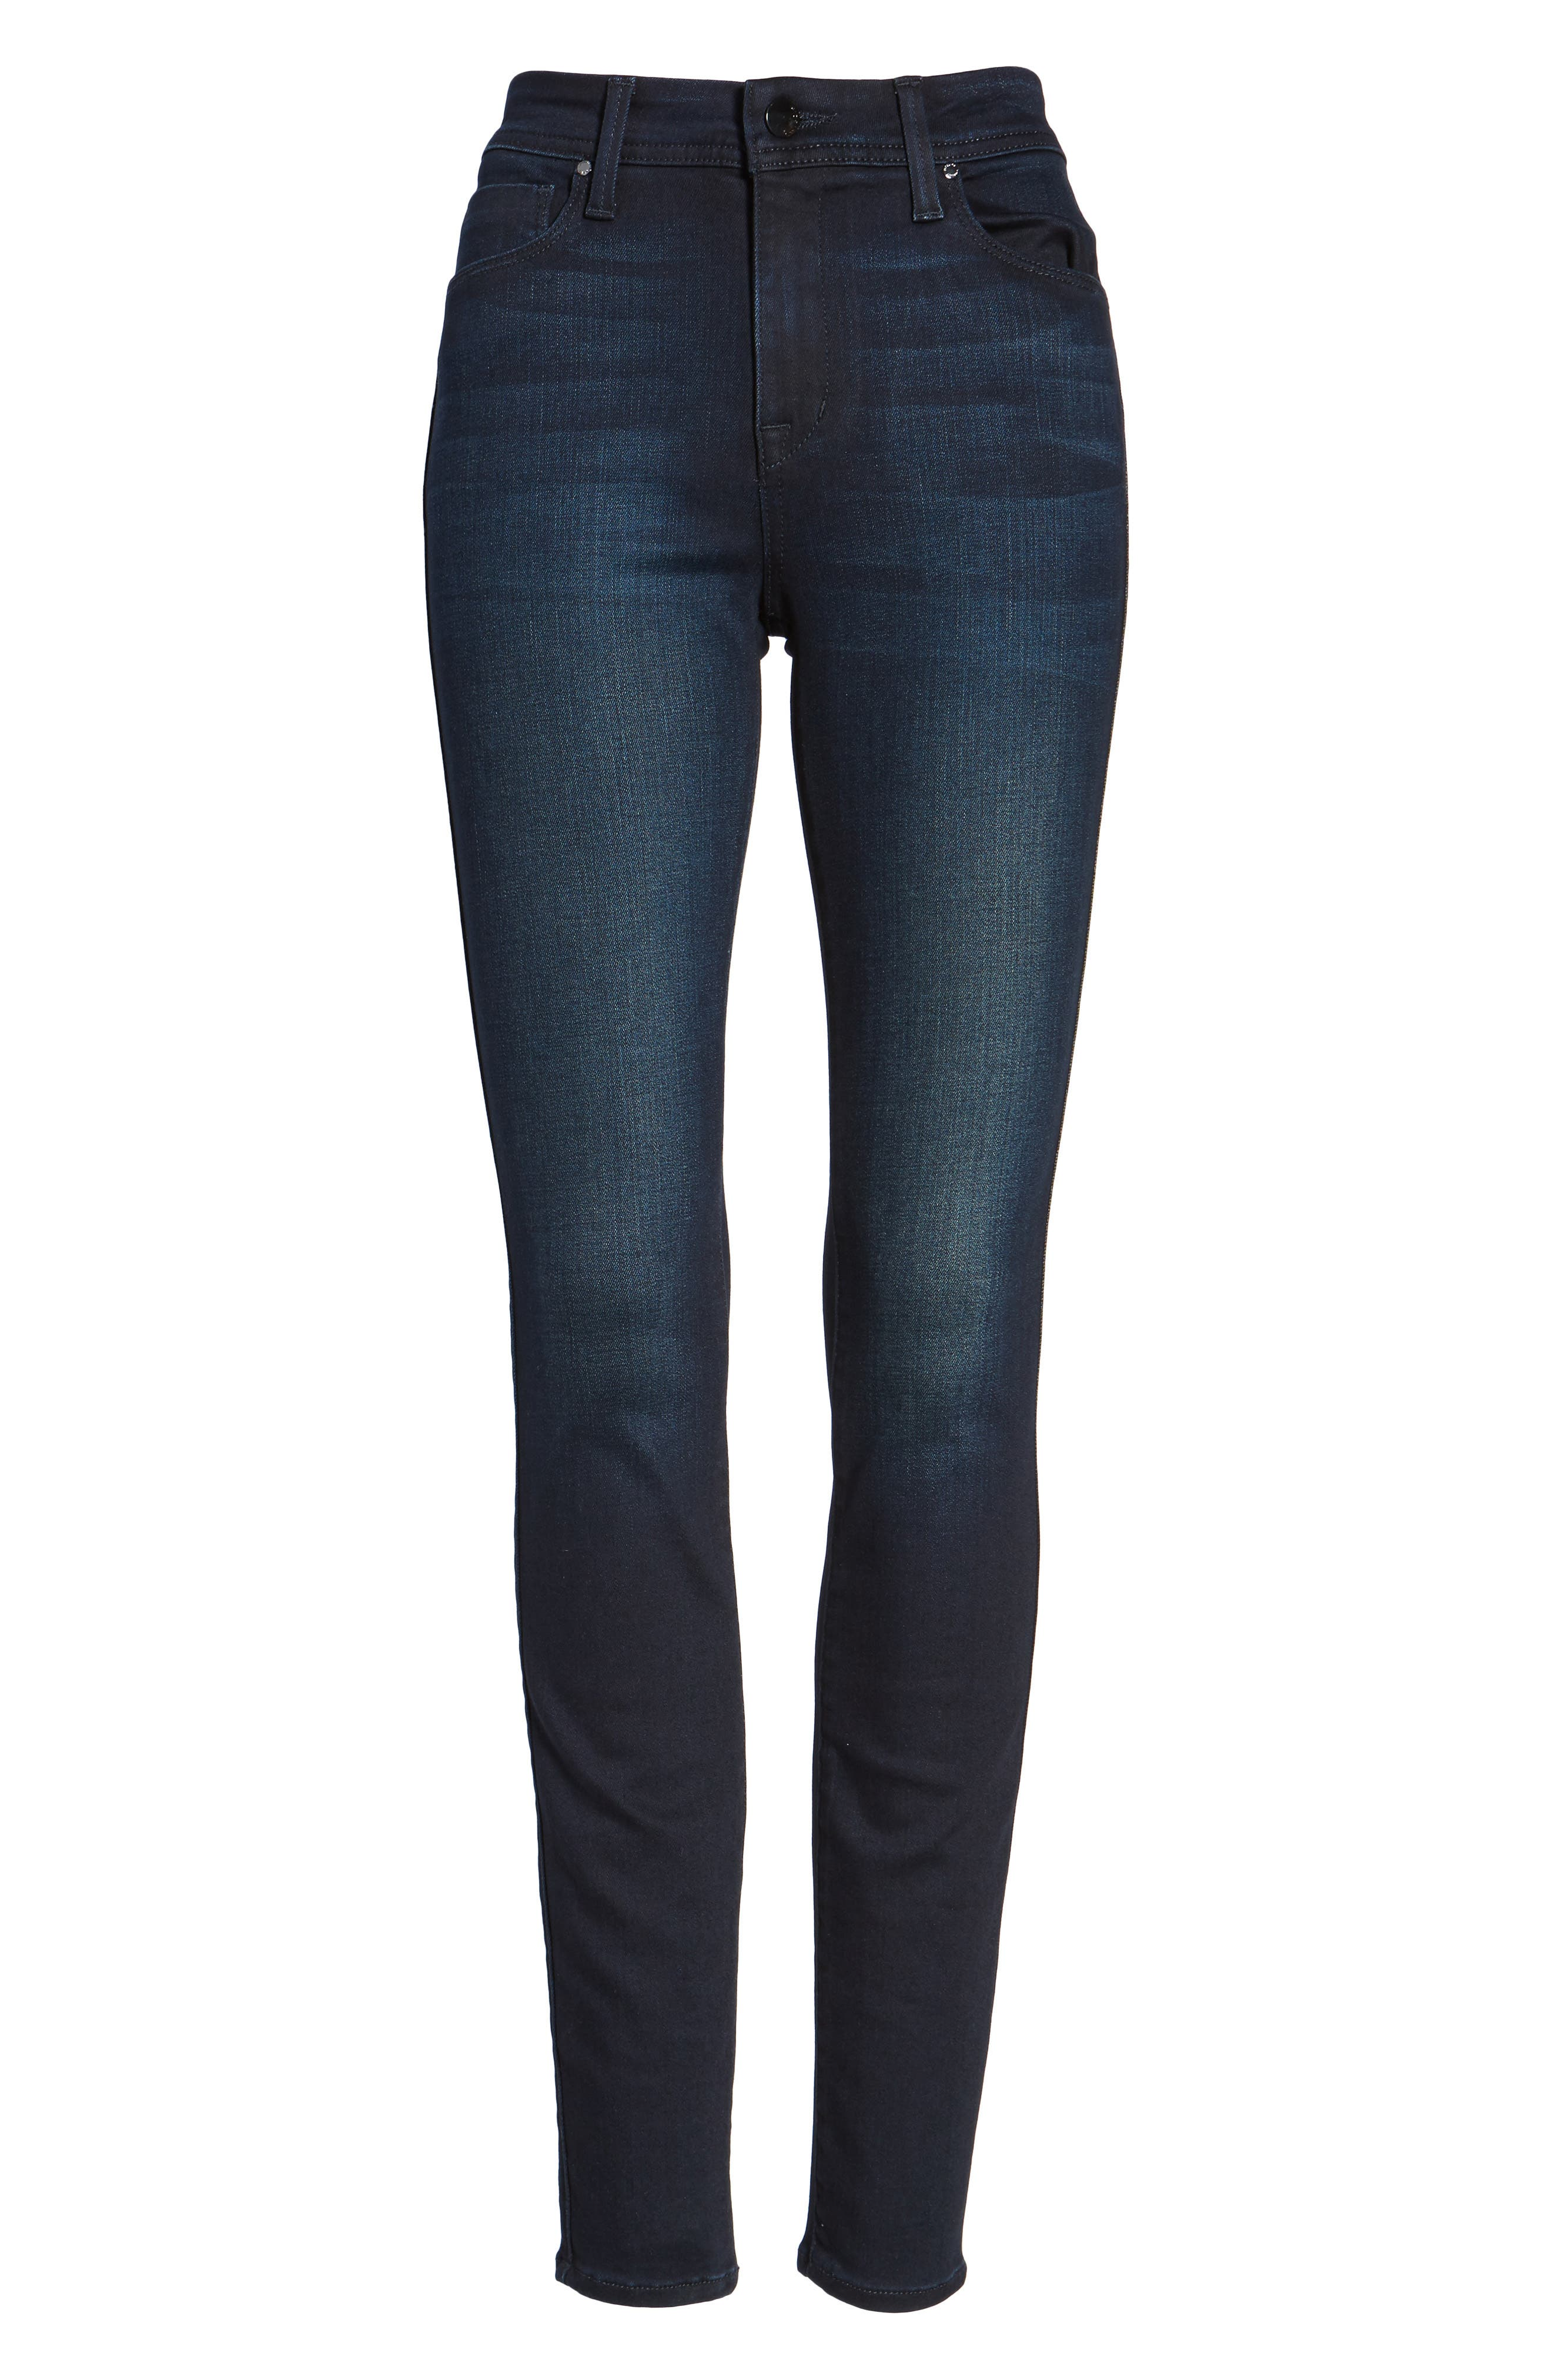 Fidelity Jeans Belvedere Skinny Jeans,                             Alternate thumbnail 6, color,                             400